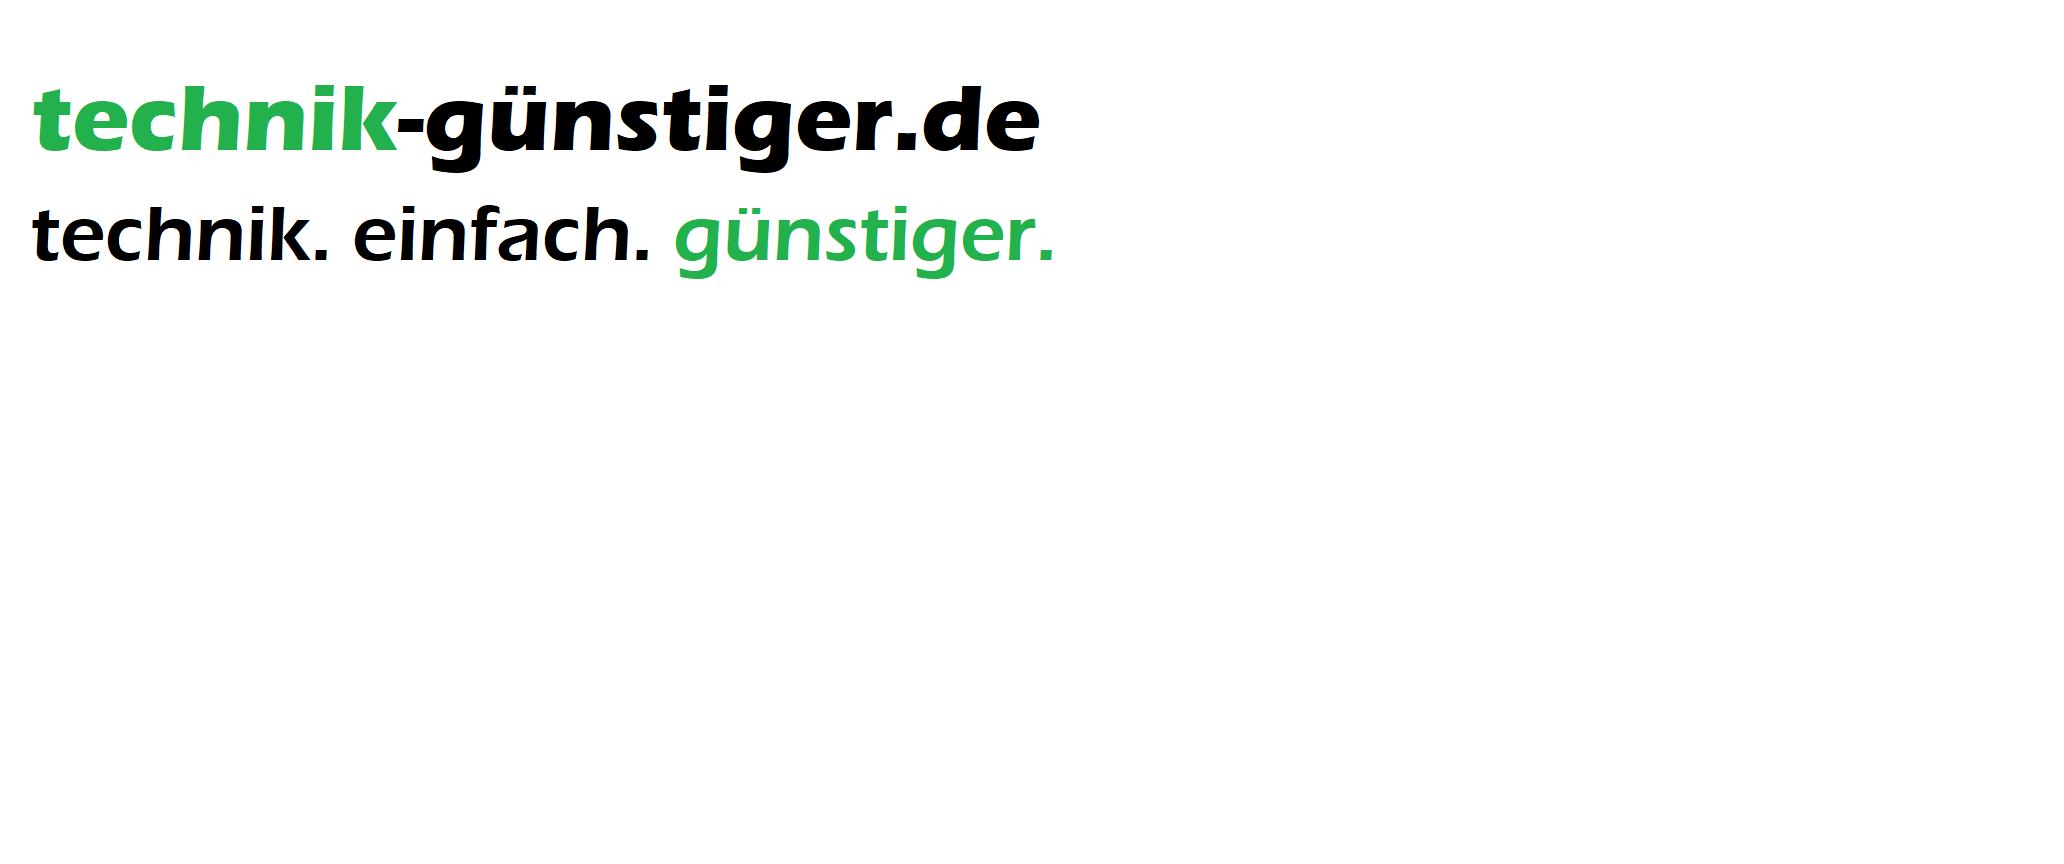 www.technik-guenstiger.de